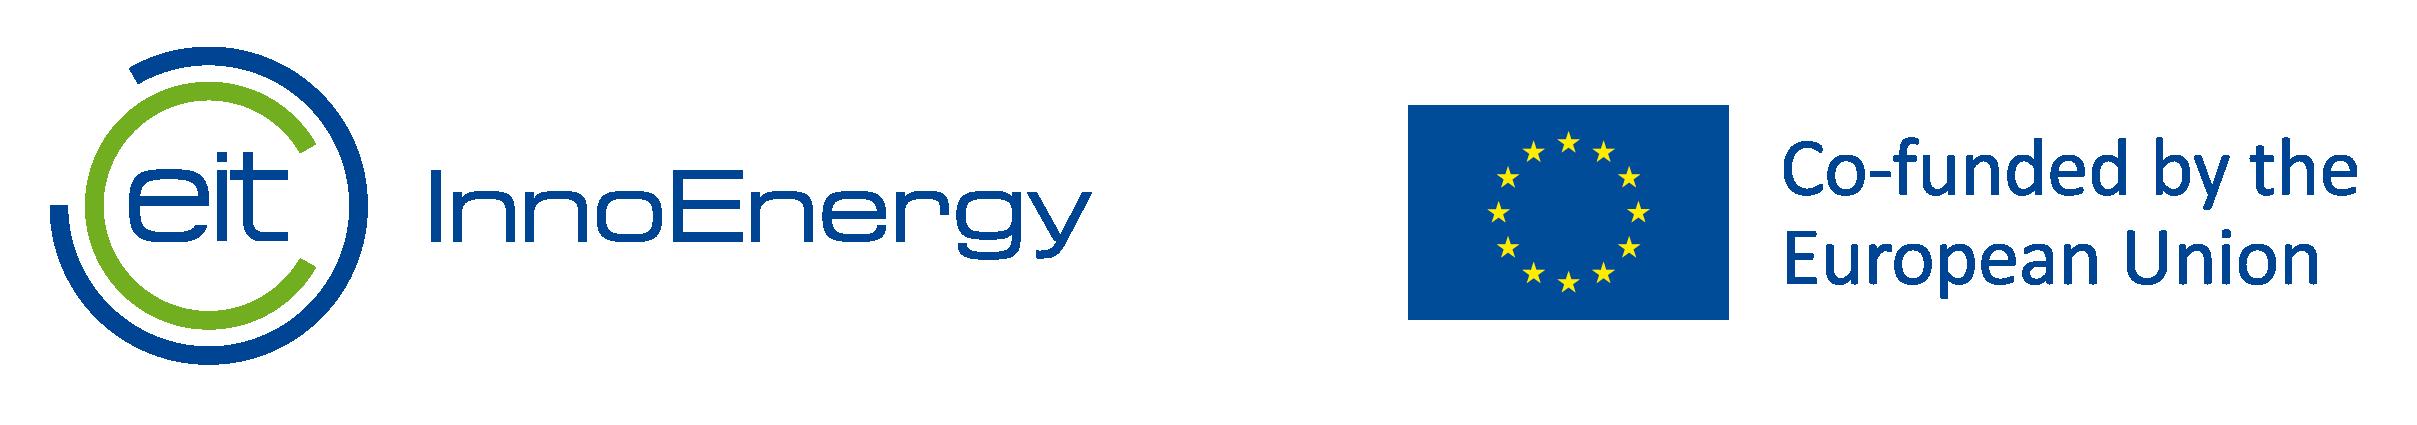 EIT InnoEnergy CommUnity logo